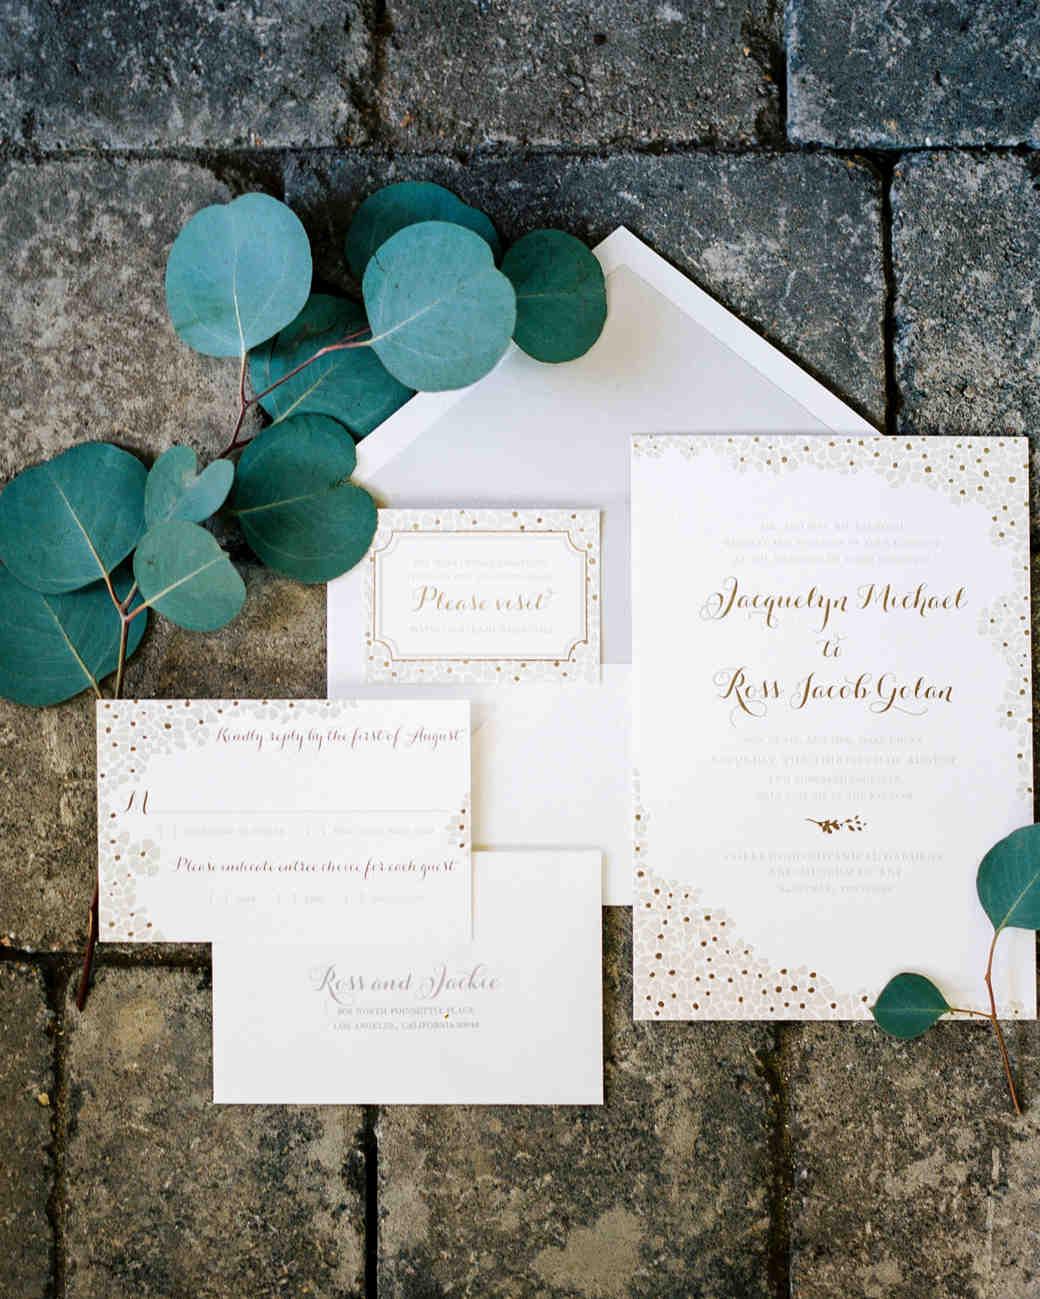 jackie-ross-wedding-invite-005-s111775-0215.jpg